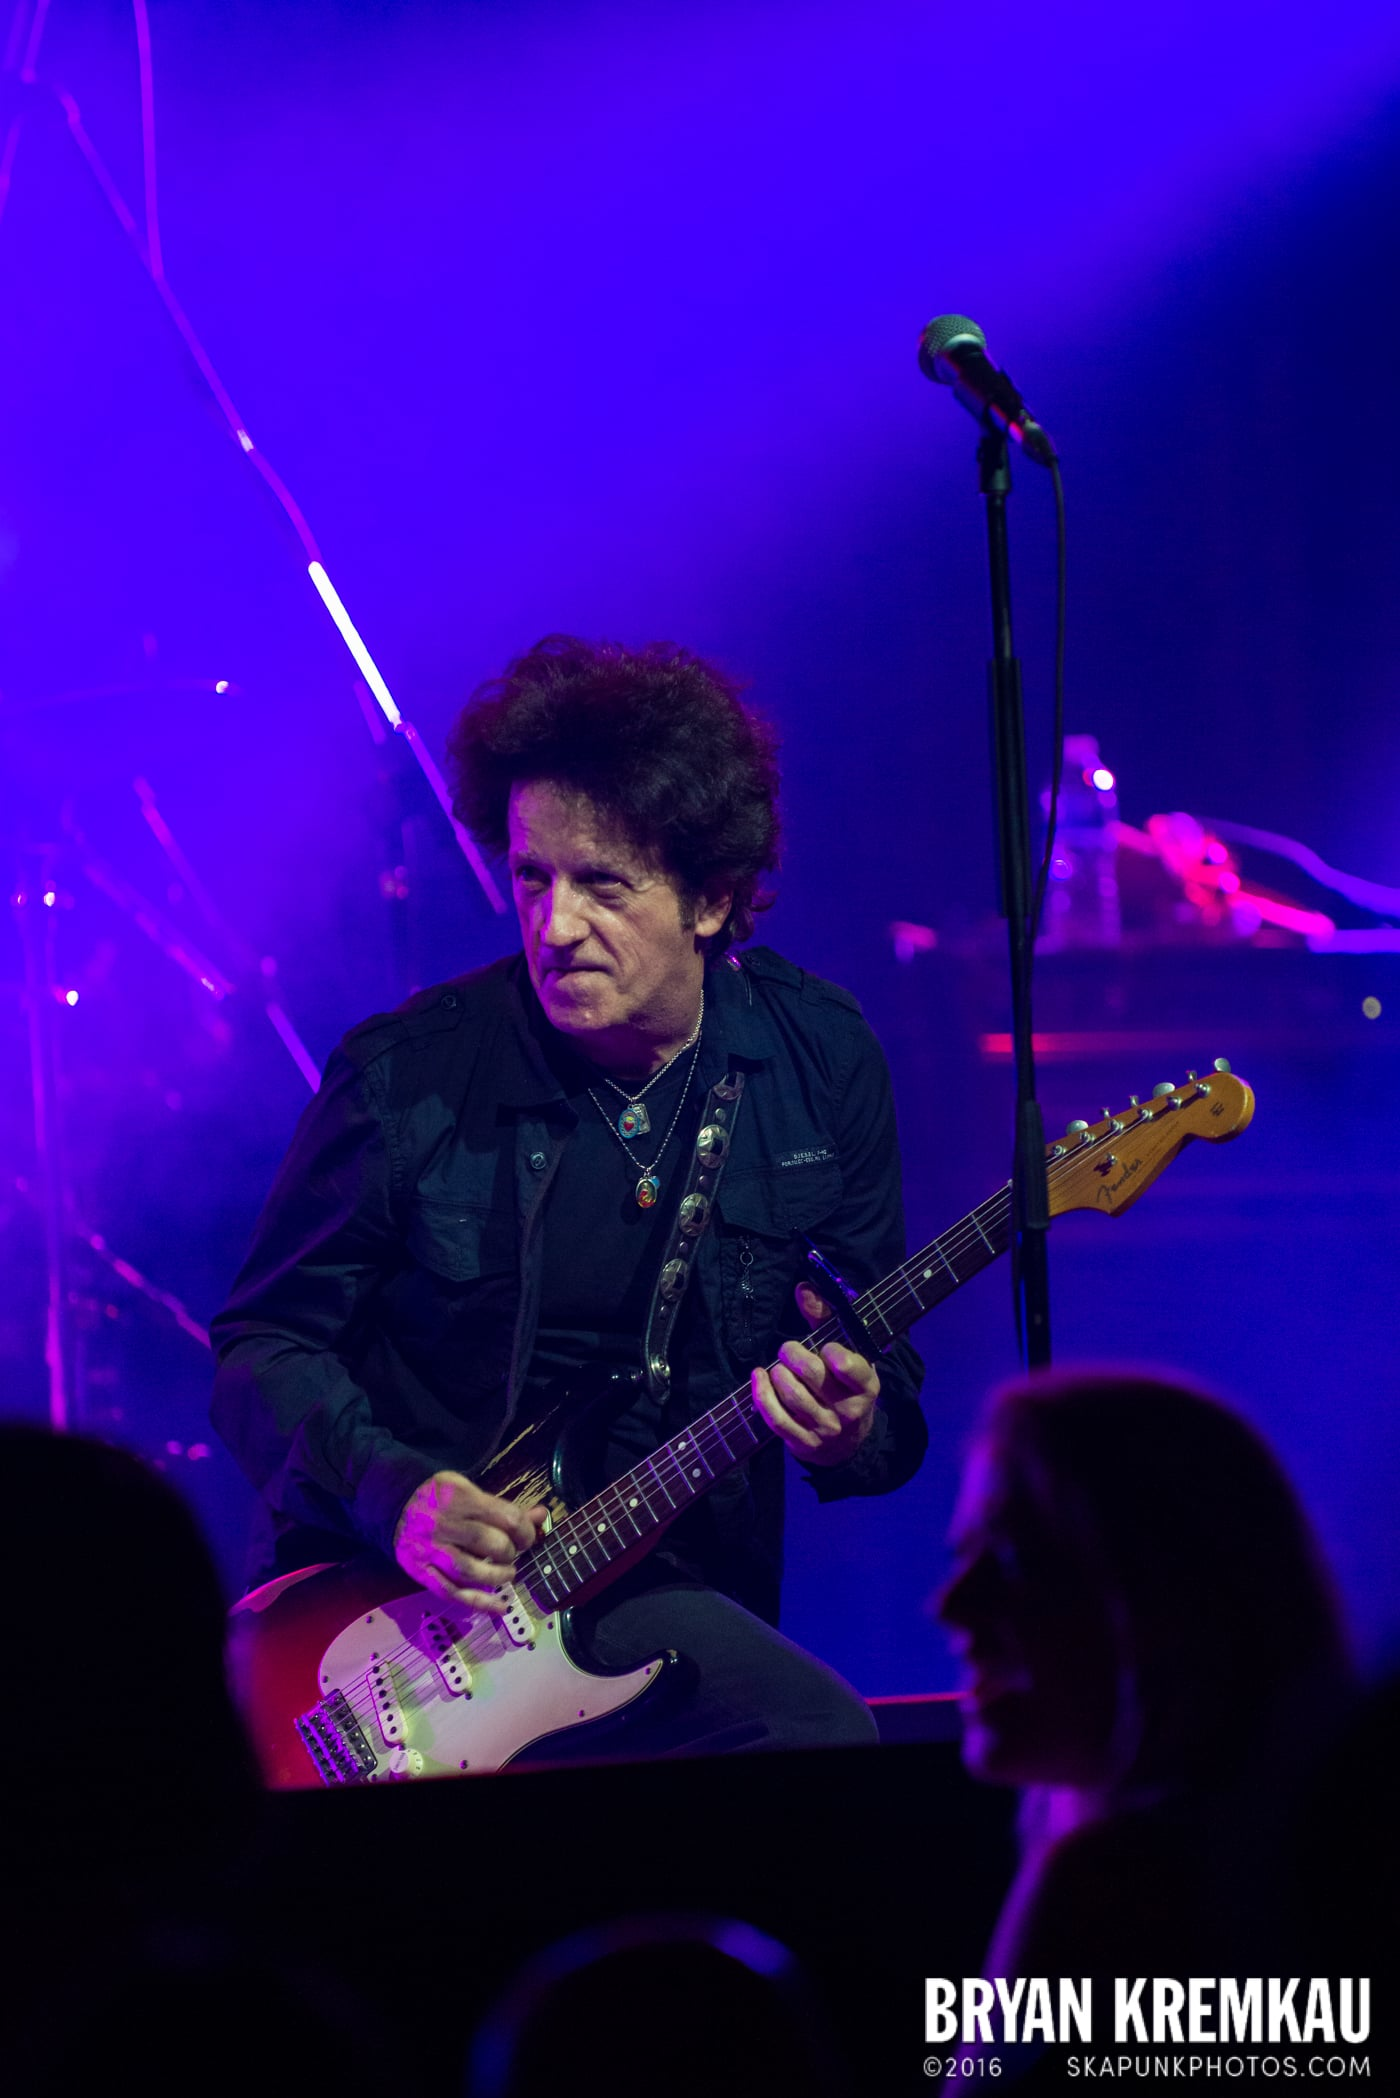 Willie Nile @ Highline Ballroom, NYC - 12.26.14 (44)